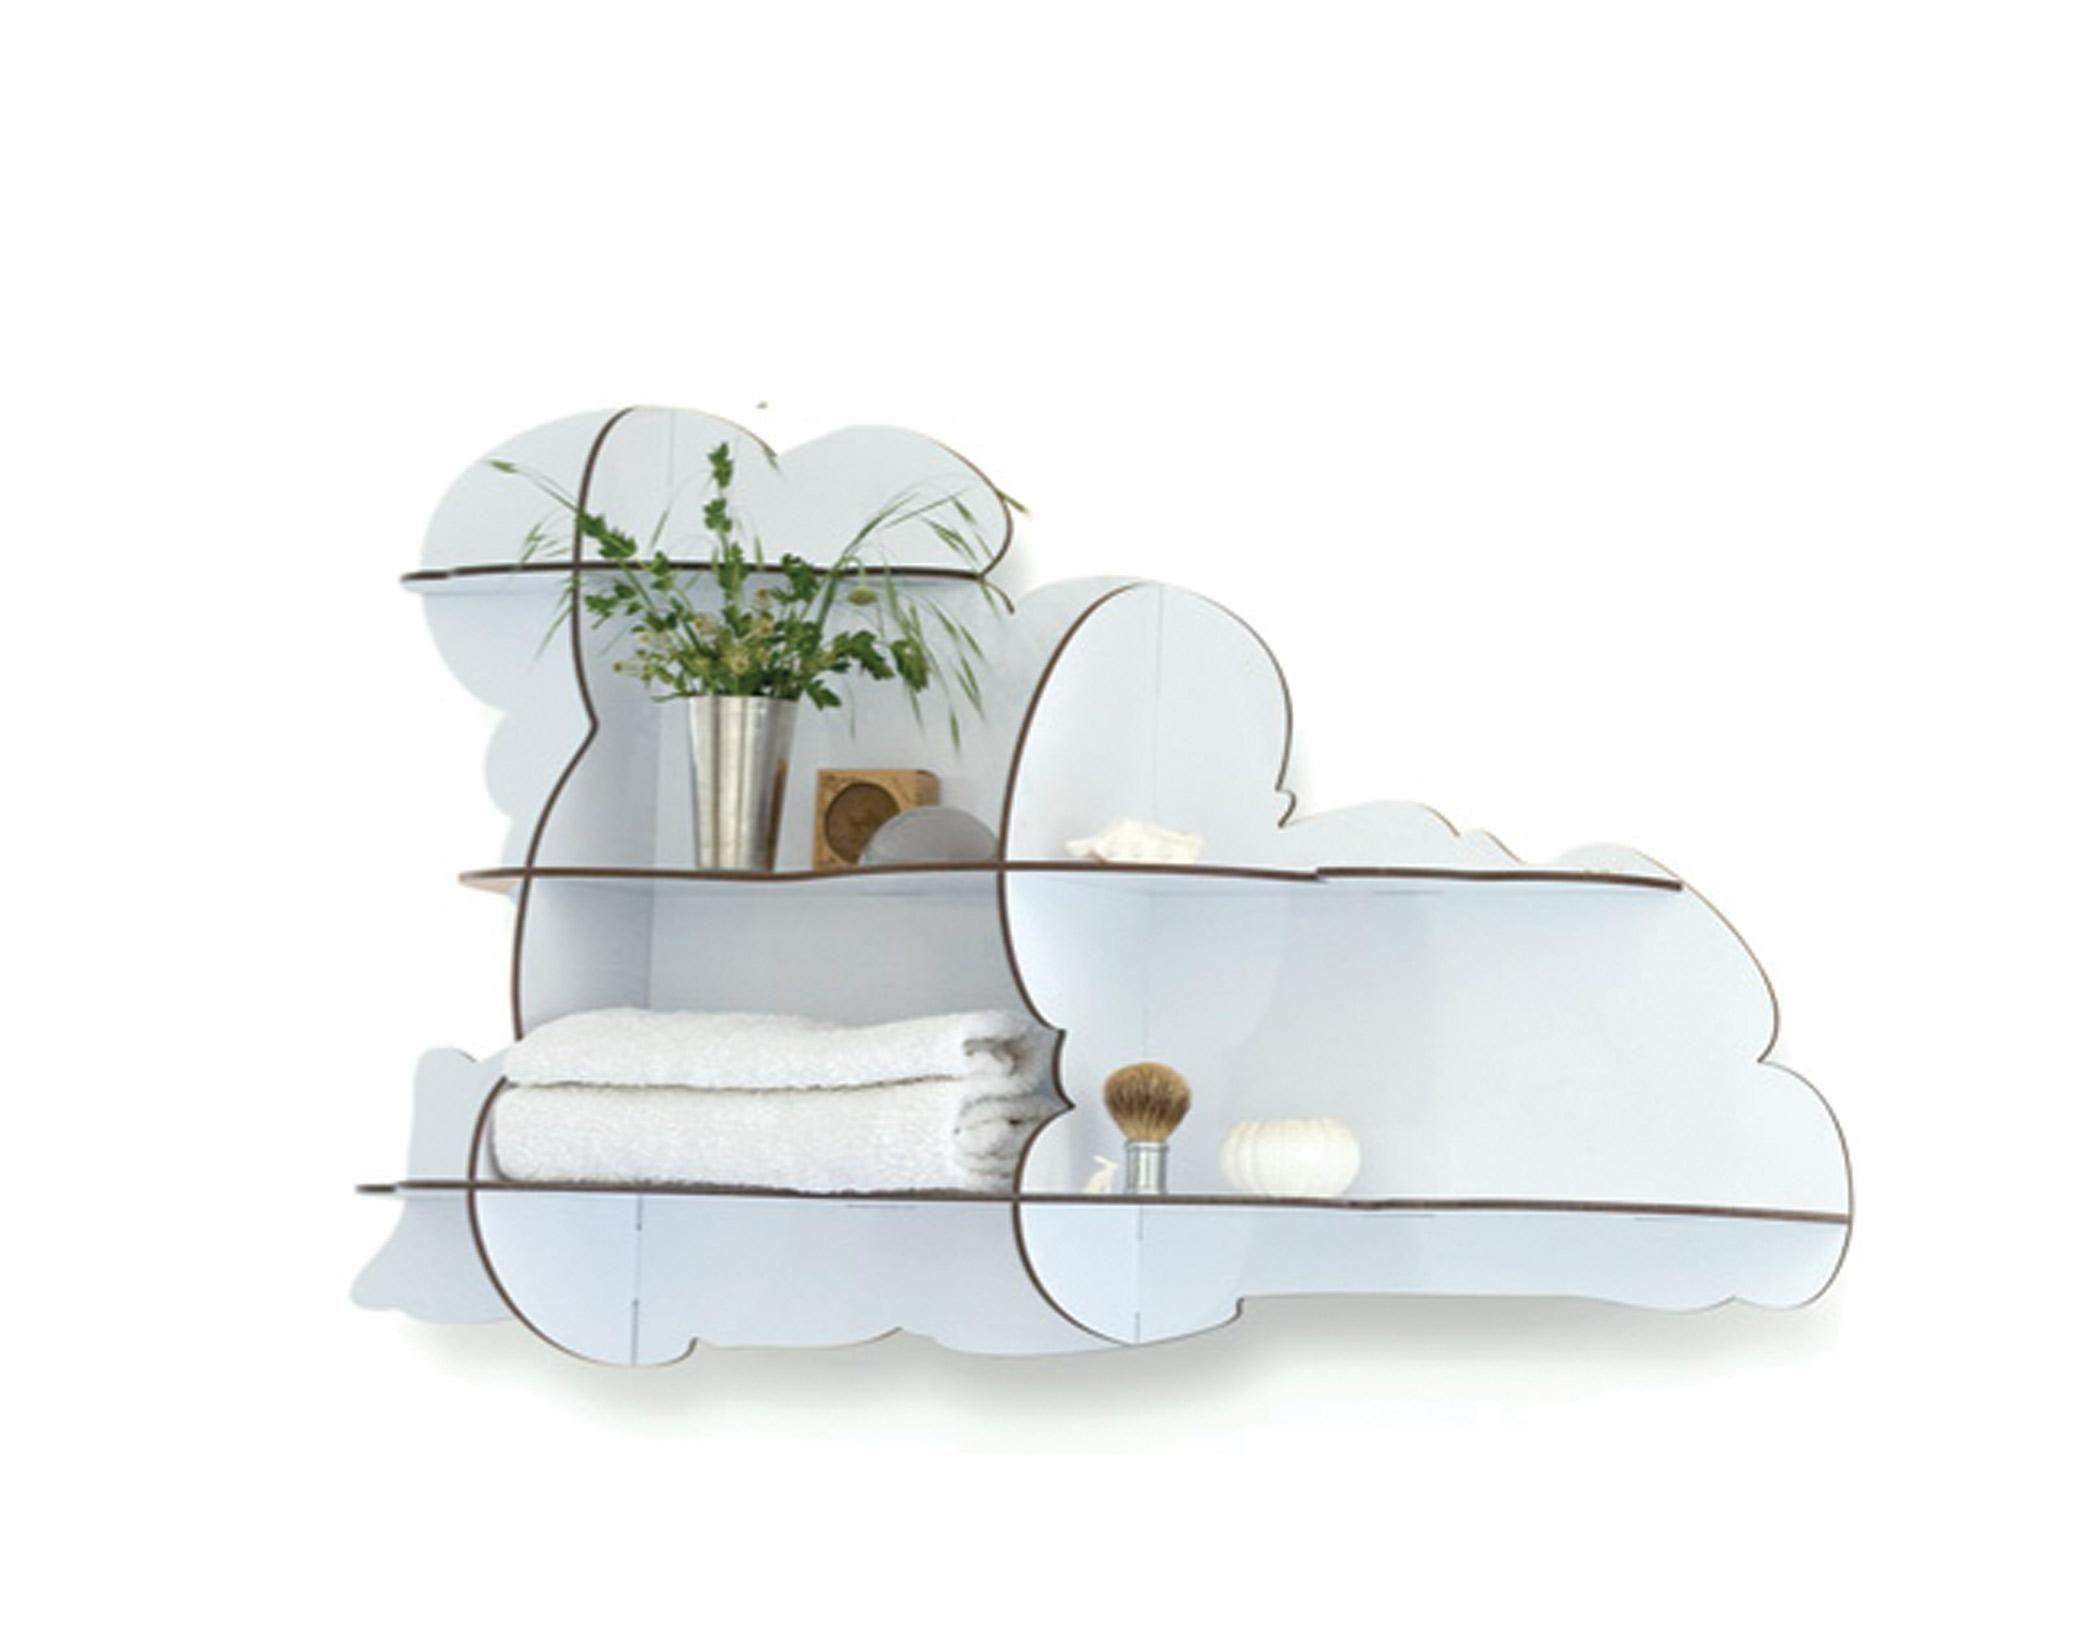 Cloud shelf housewares pinterest shelving product design and